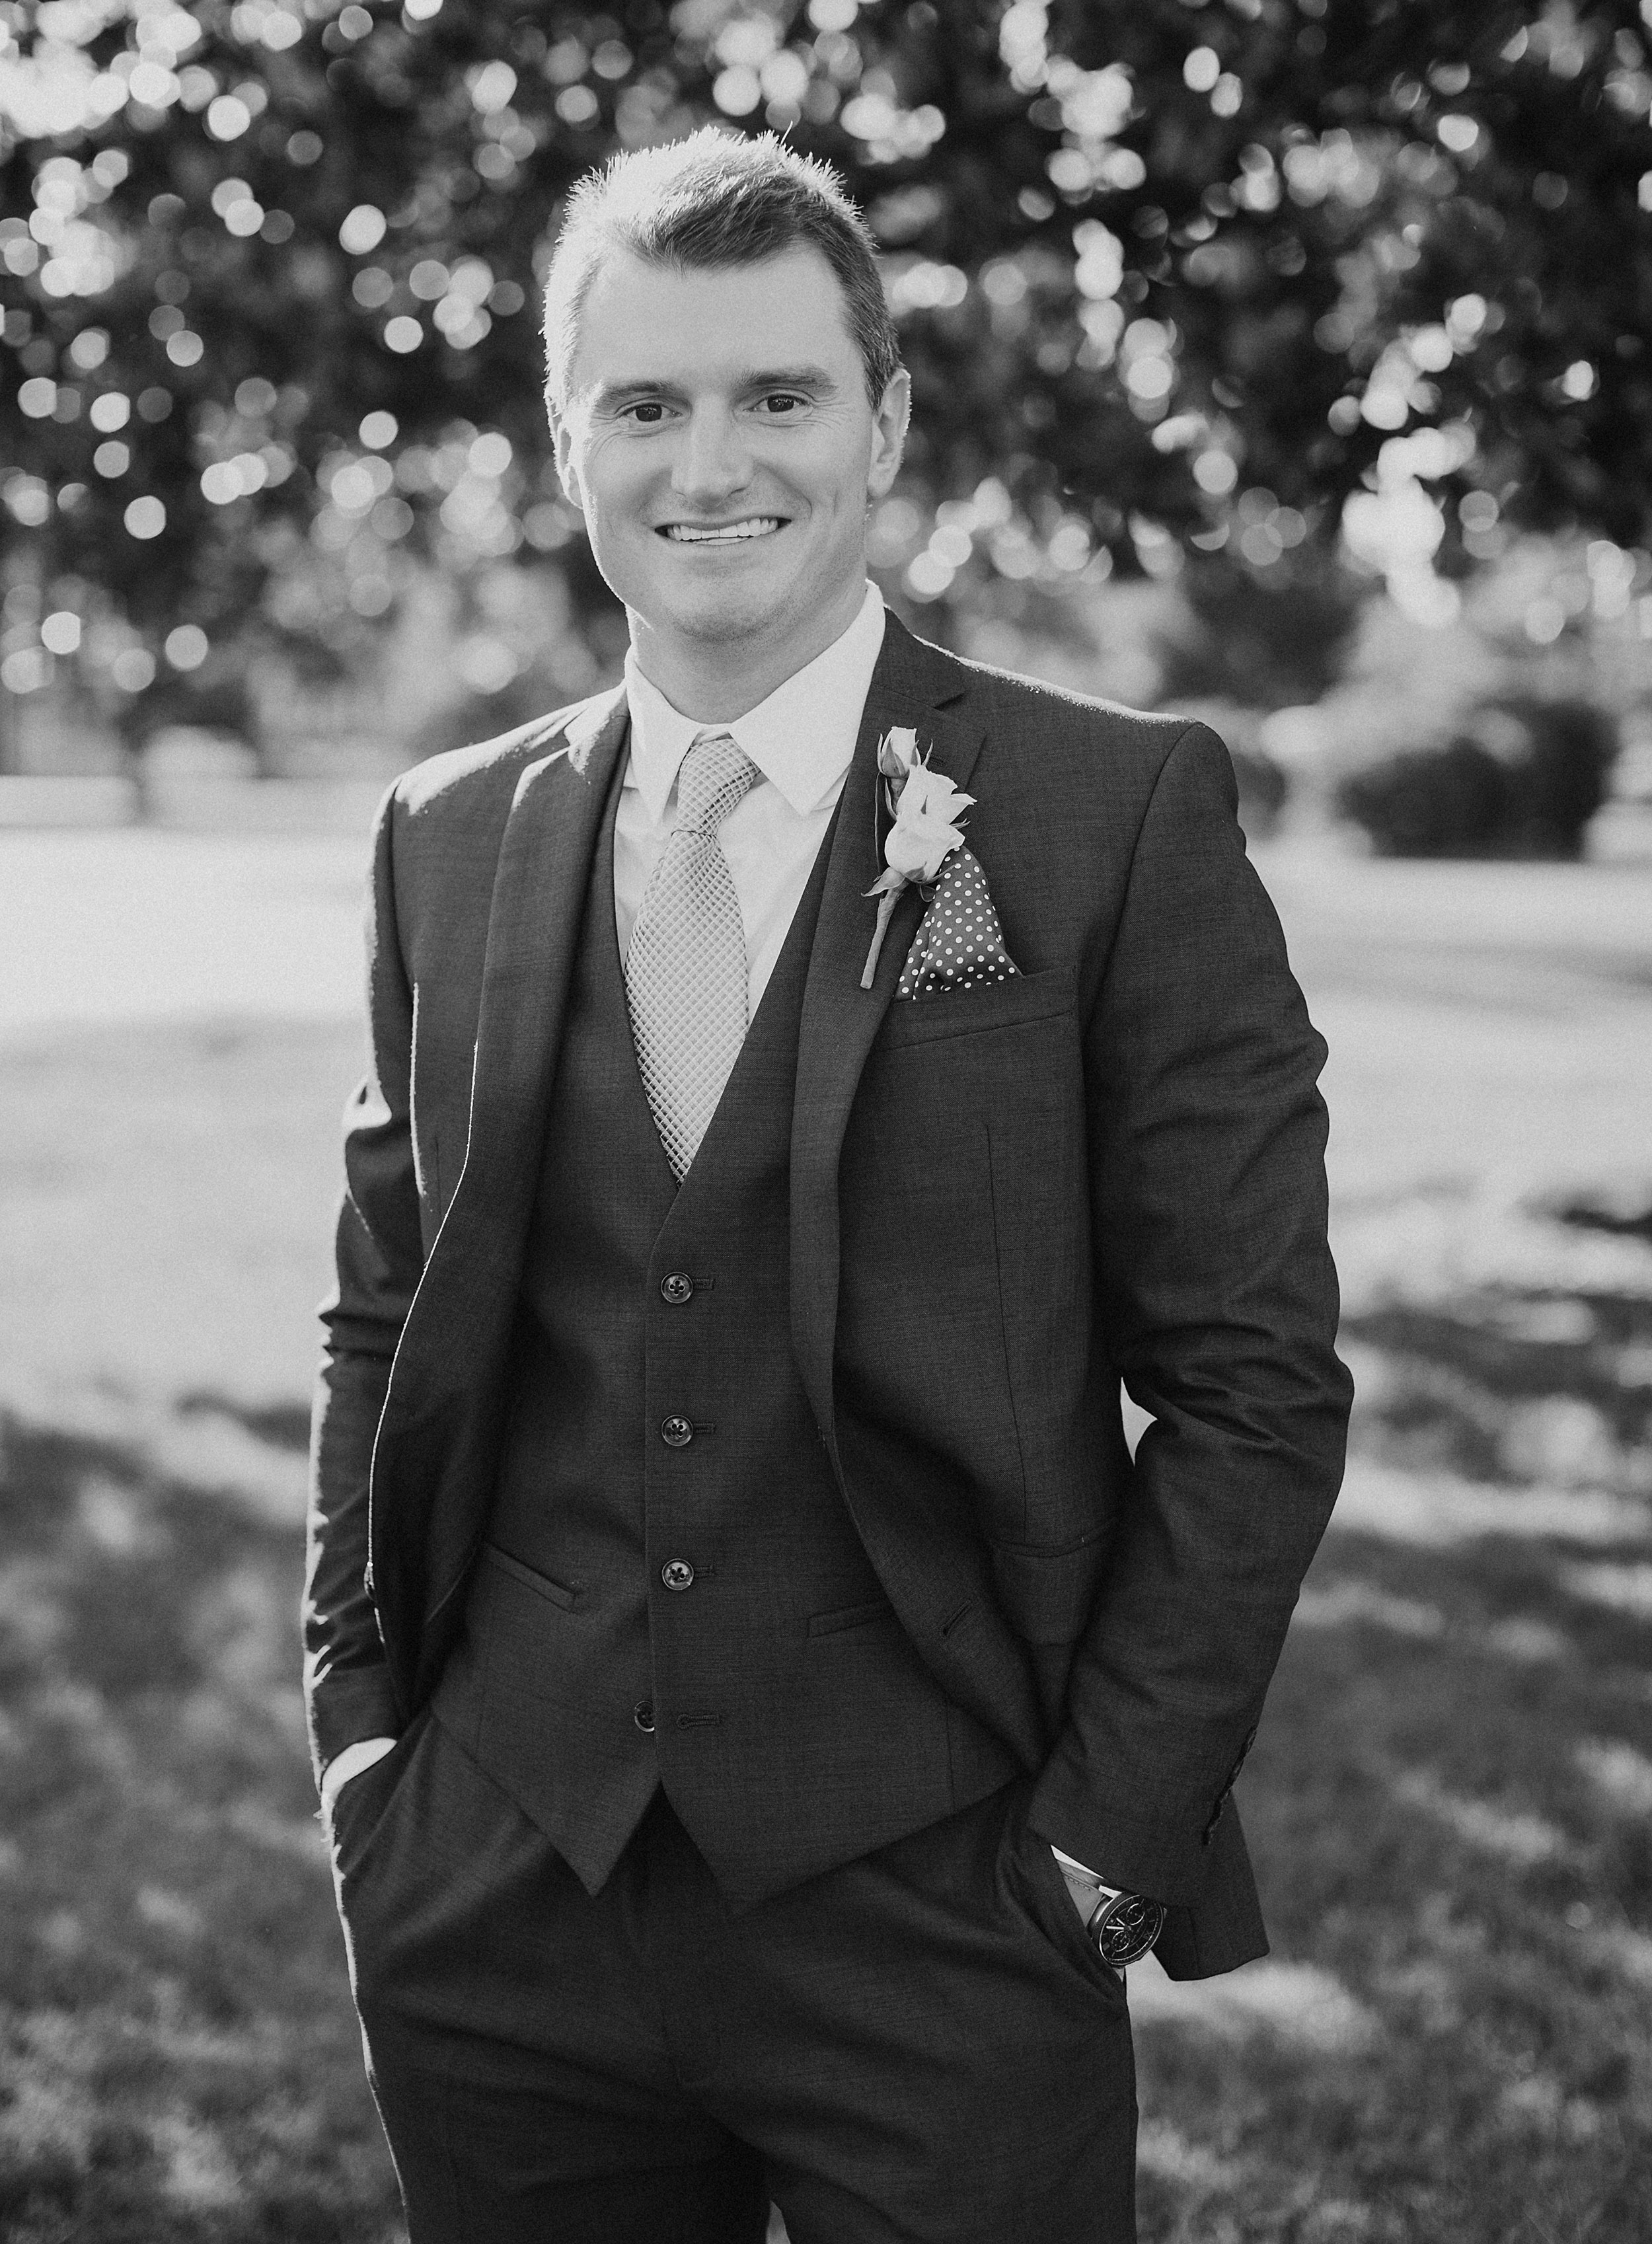 olmsted-wedding-louisville-kentucky-021.JPG